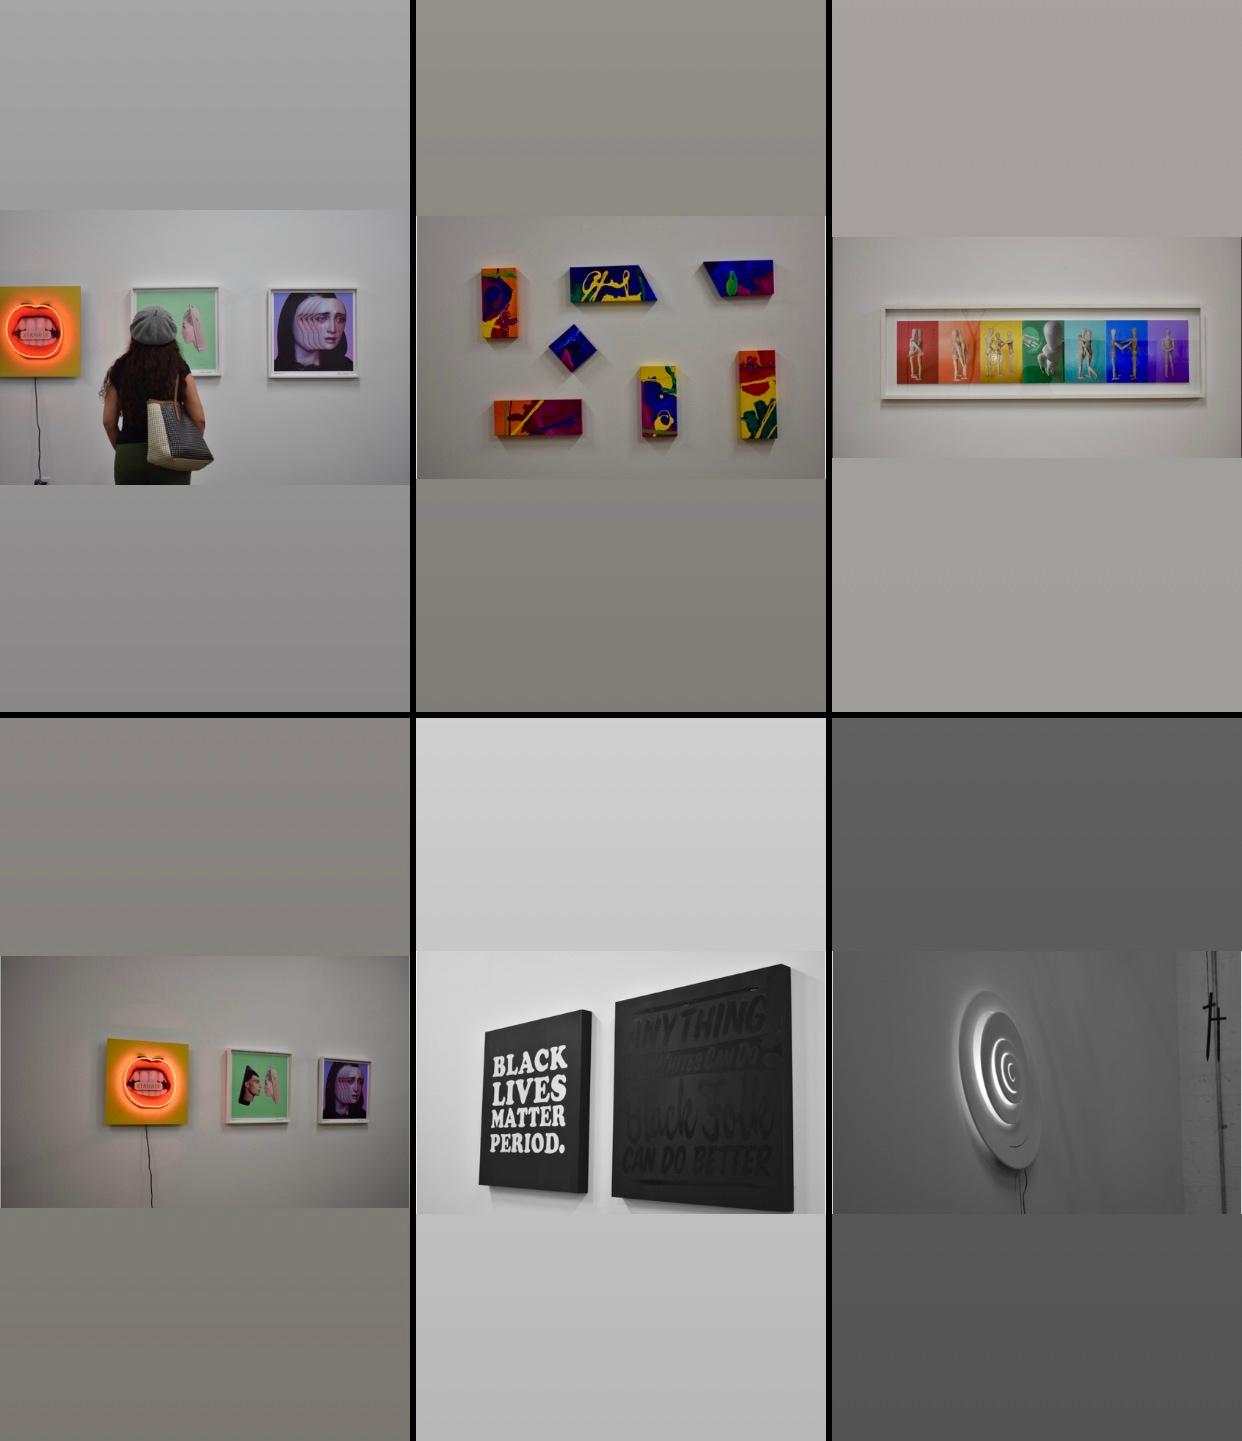 d | a | c  art space